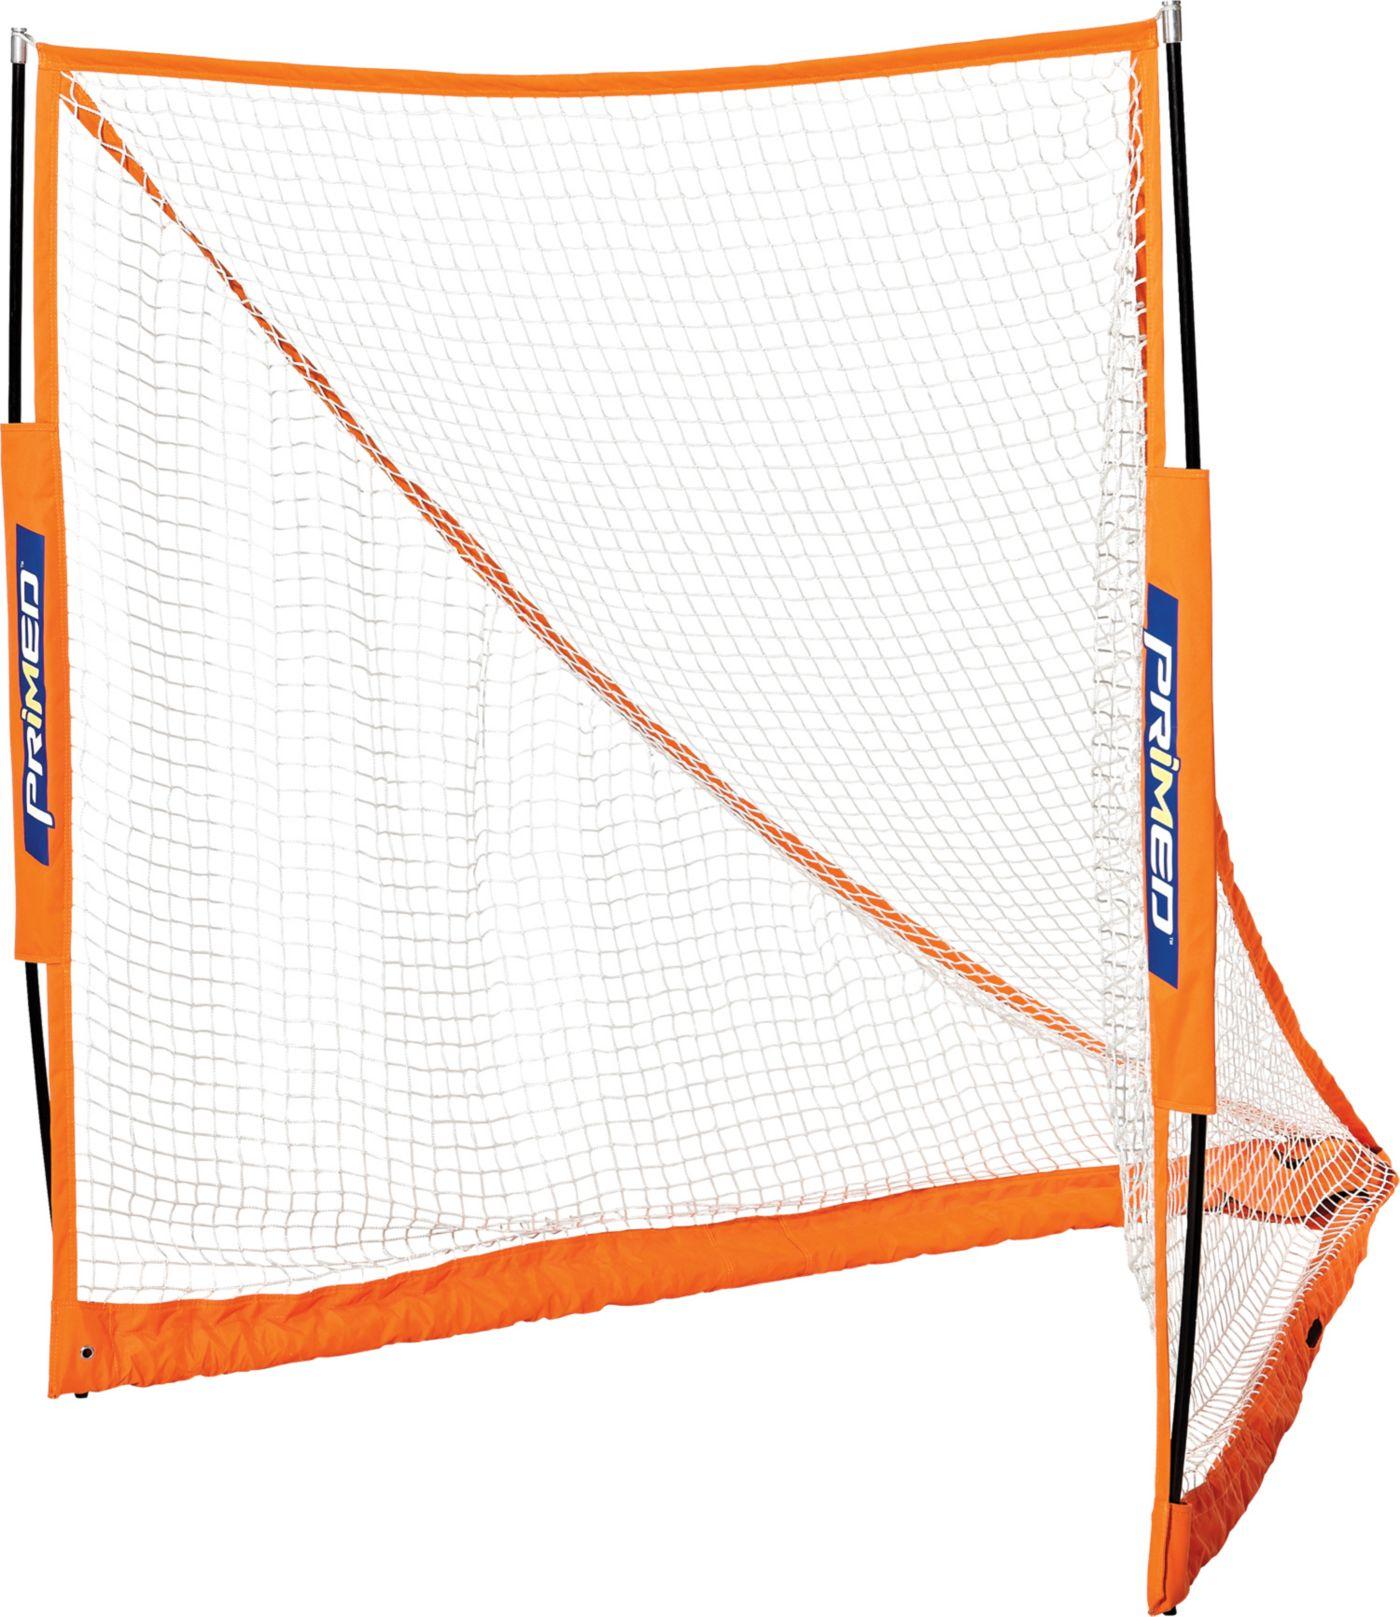 PRIMED 6' x 6' Instant Lacrosse Goal